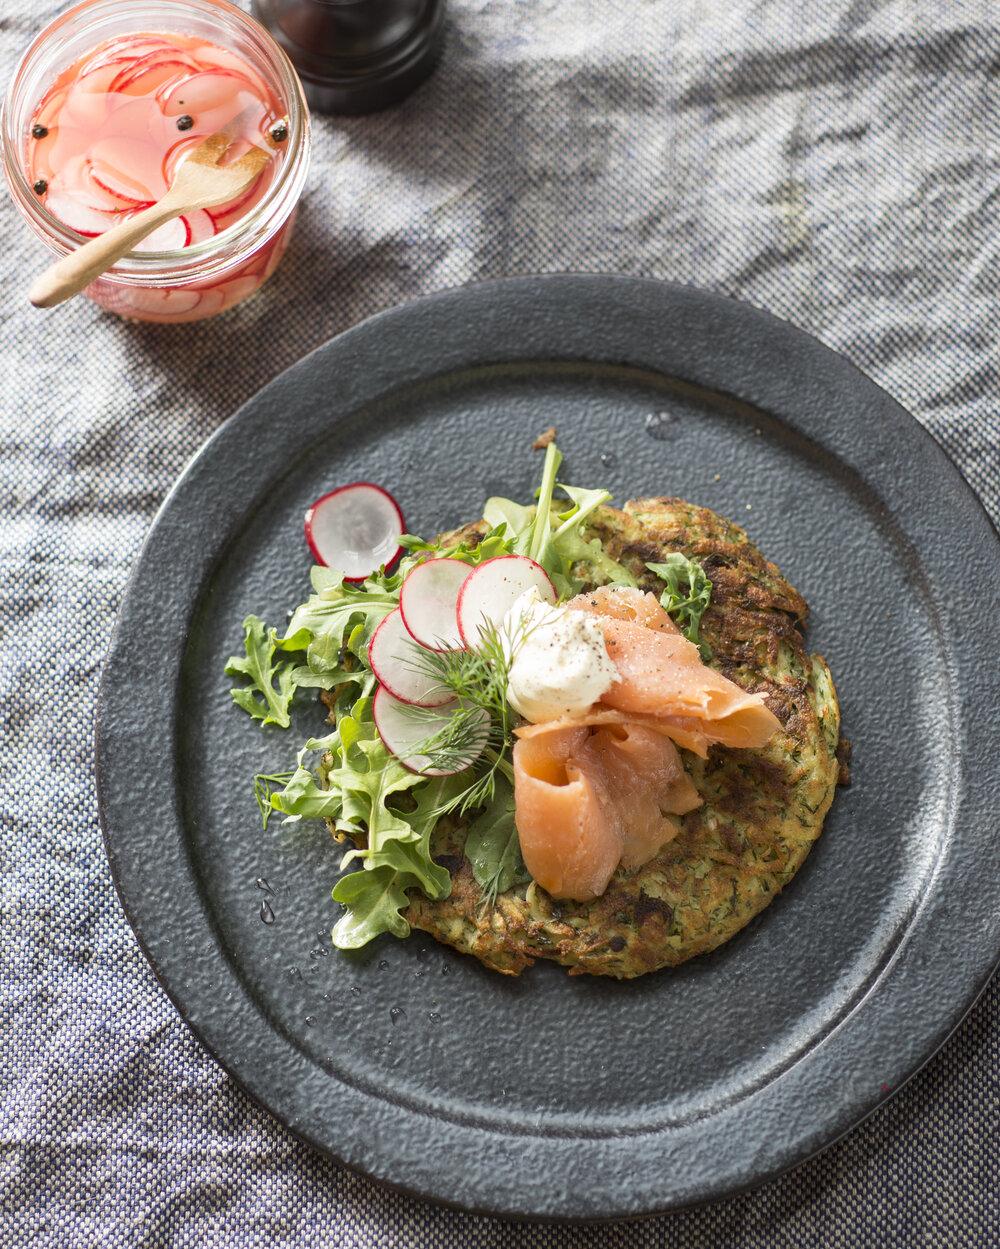 Red Potato and Ricotta Pancake with Smoked Salmon